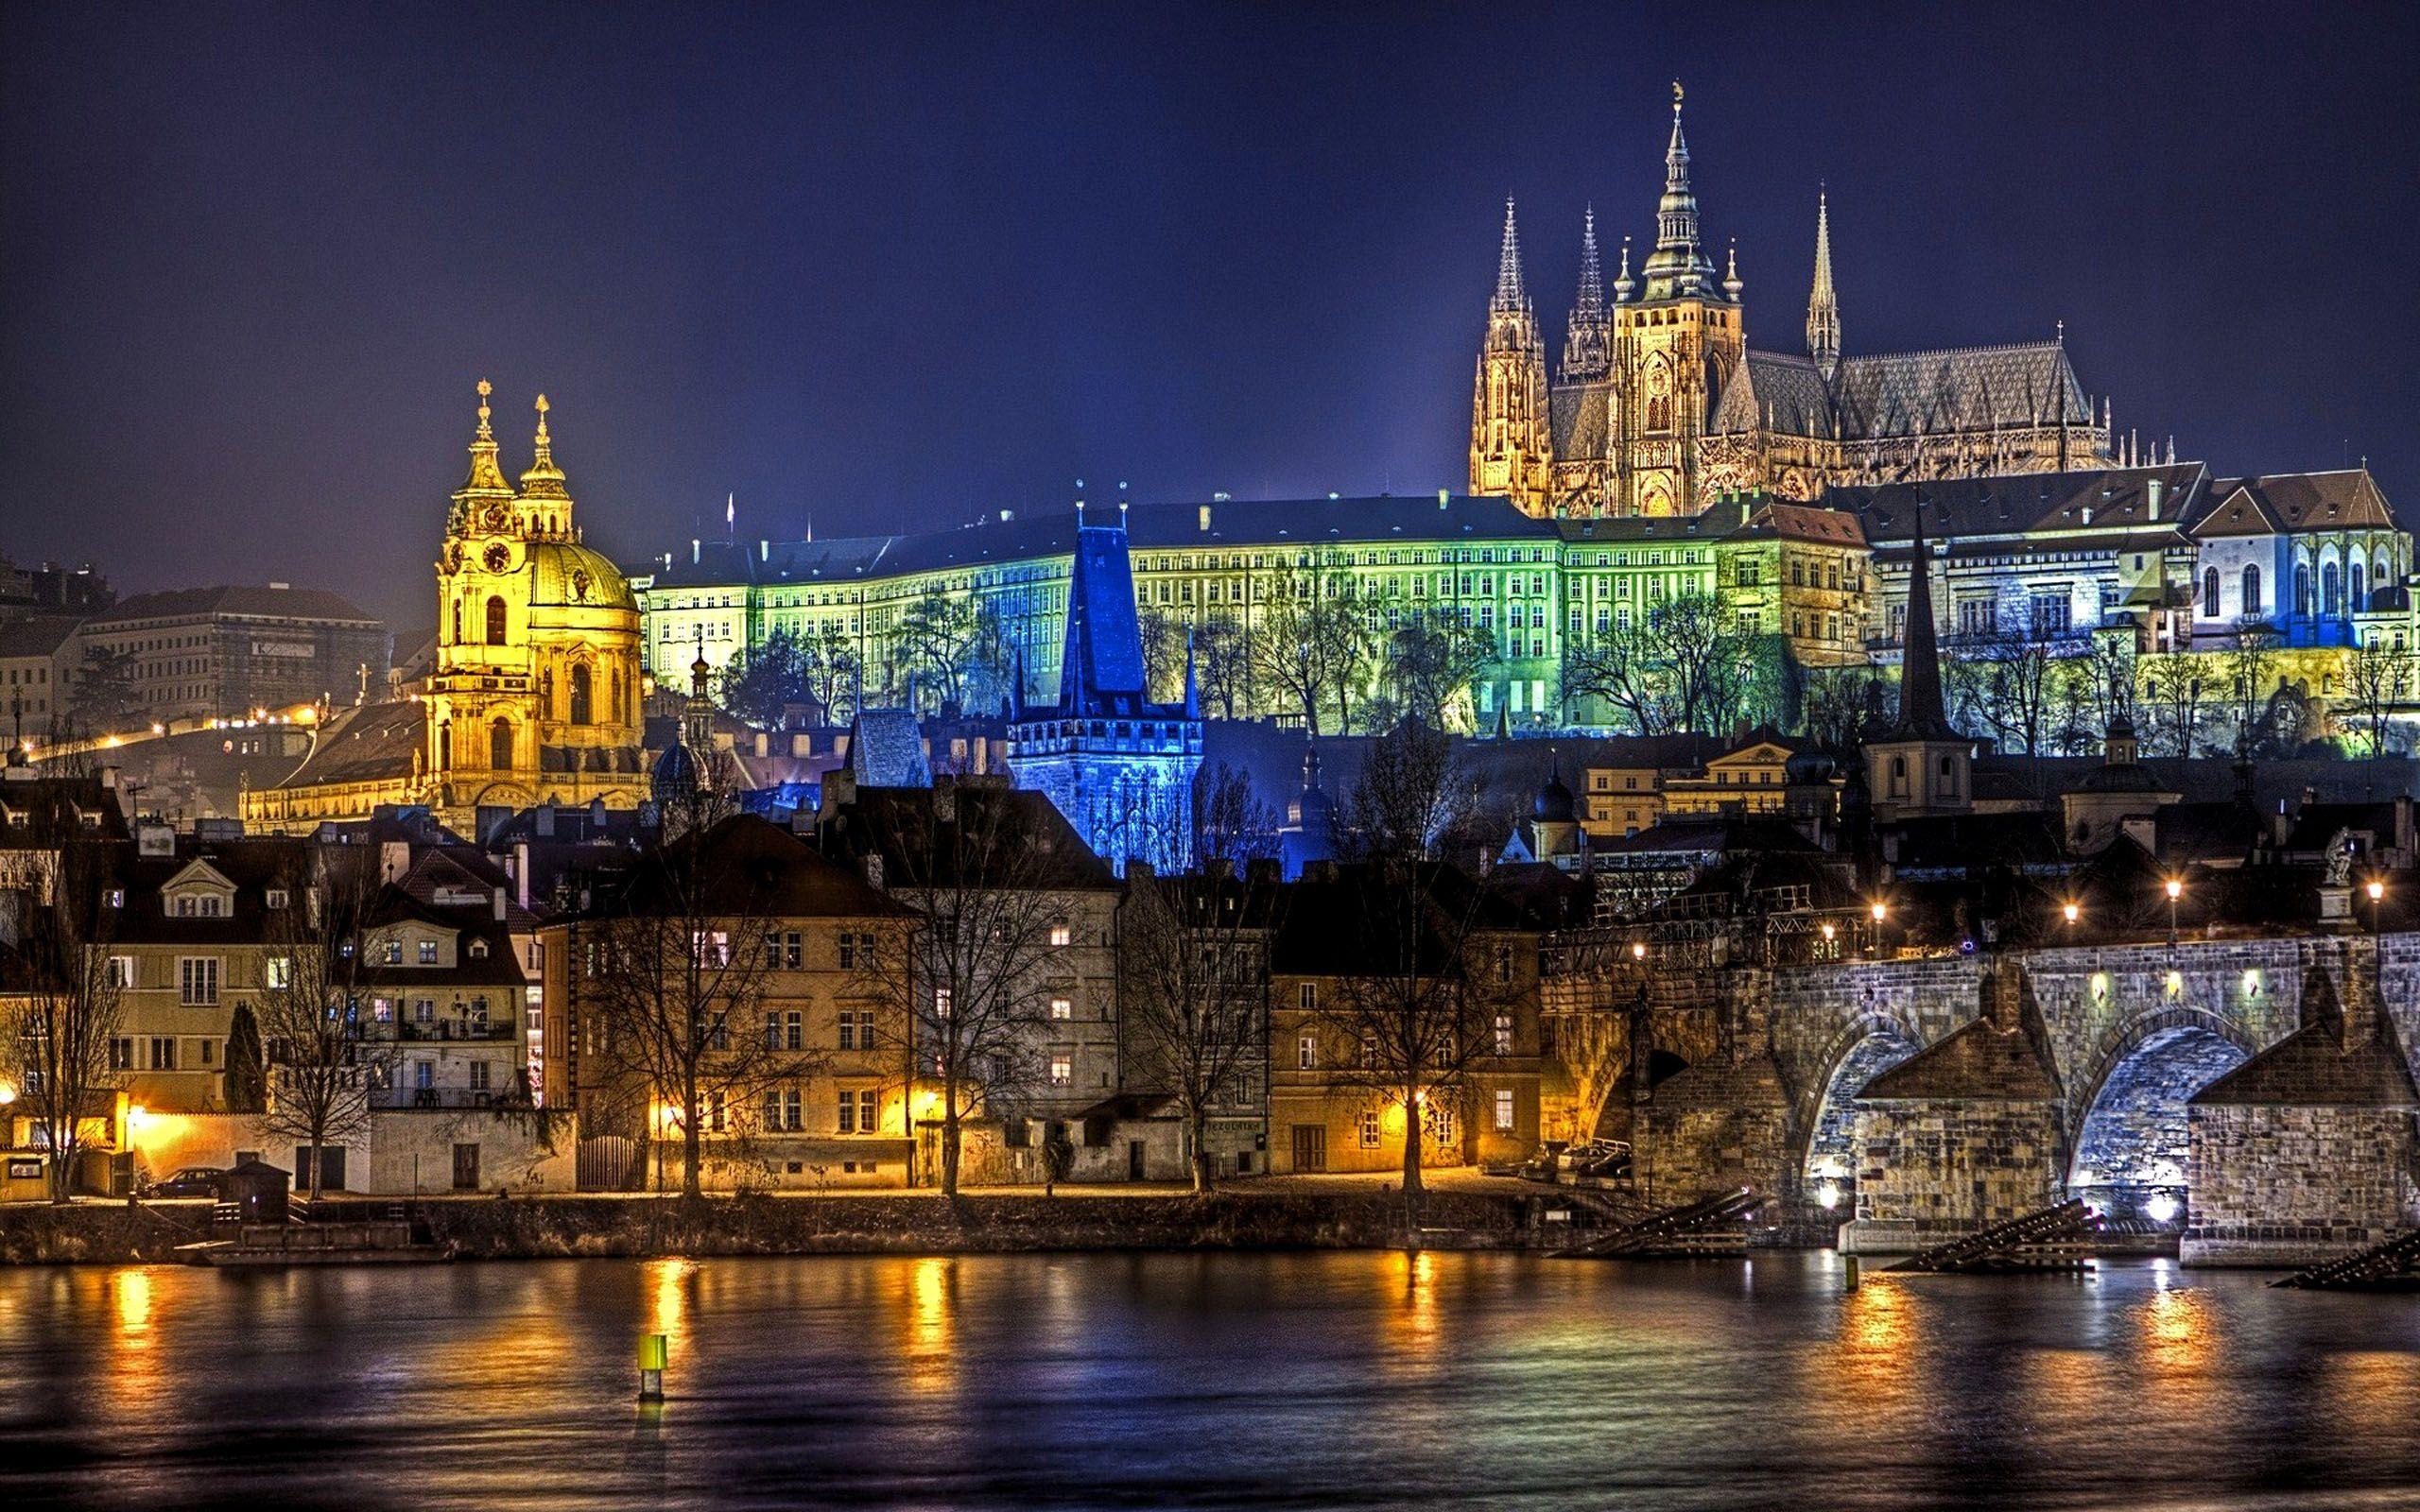 Prague at night studyoverseas | Prague/Czeck | Pinterest | Prague ...